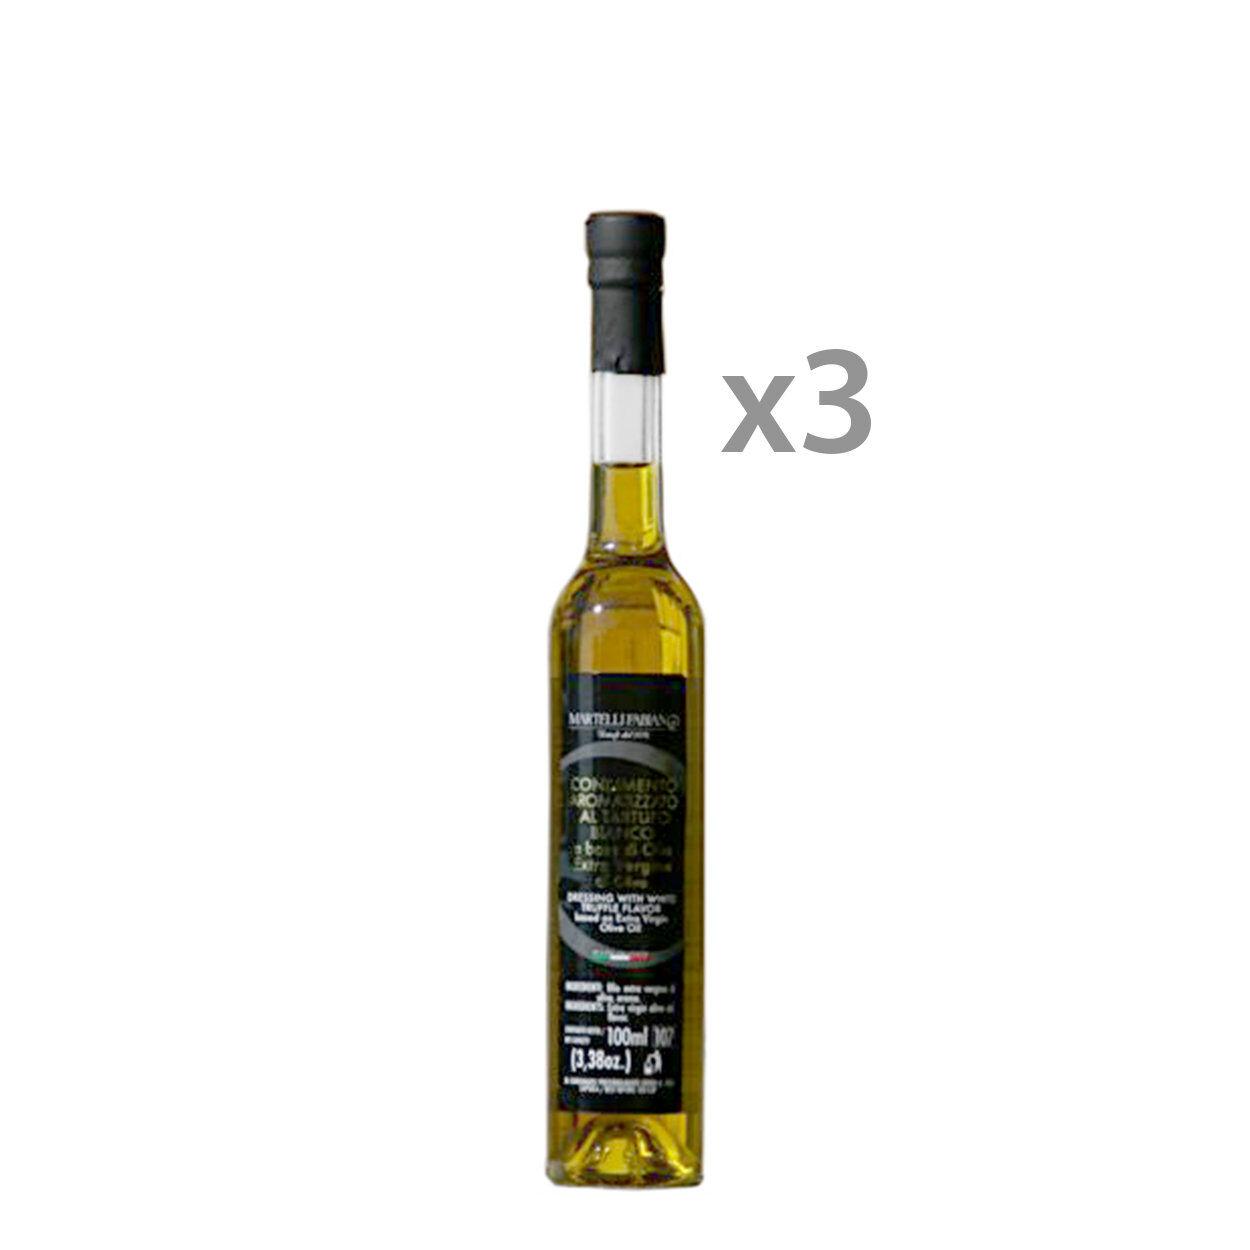 Martelli Fabiano Tartufi 3 bottiglie - Condimento aromatizzato al Tartufo Bianco 100 ml